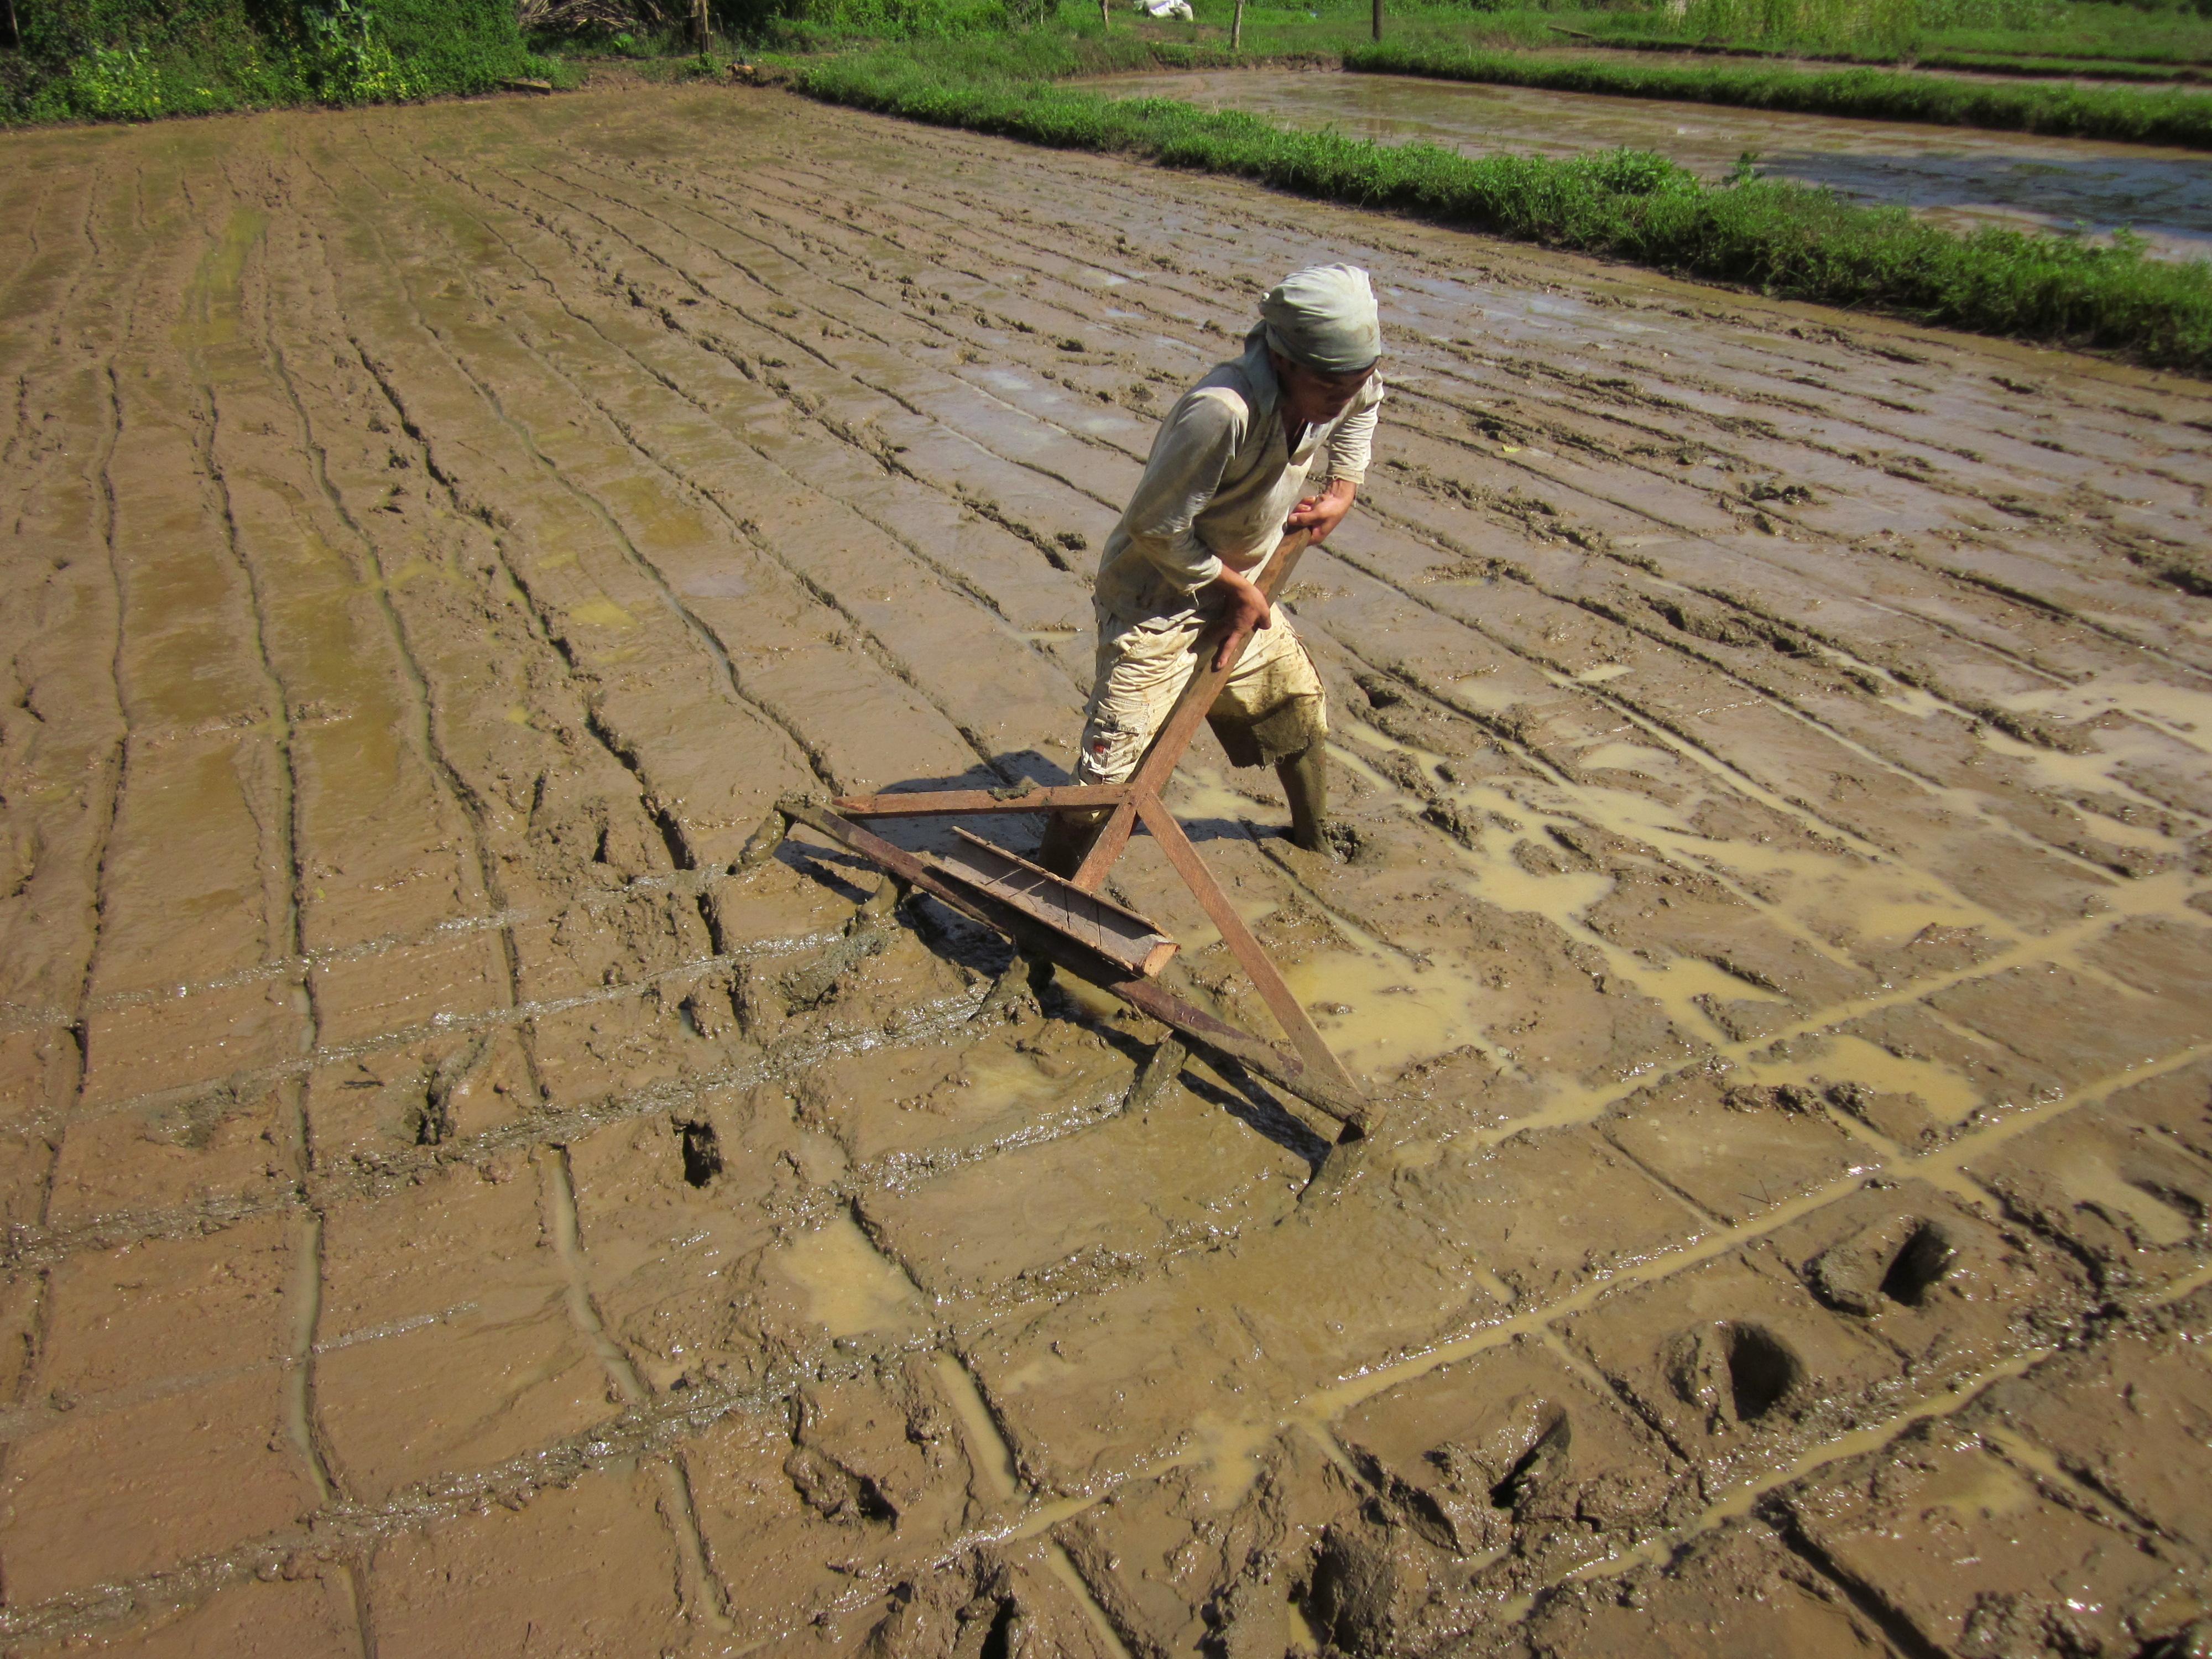 """Planting Rice is never fun"" | Bountifulharvestfarm's Site  ""Planting Ric..."